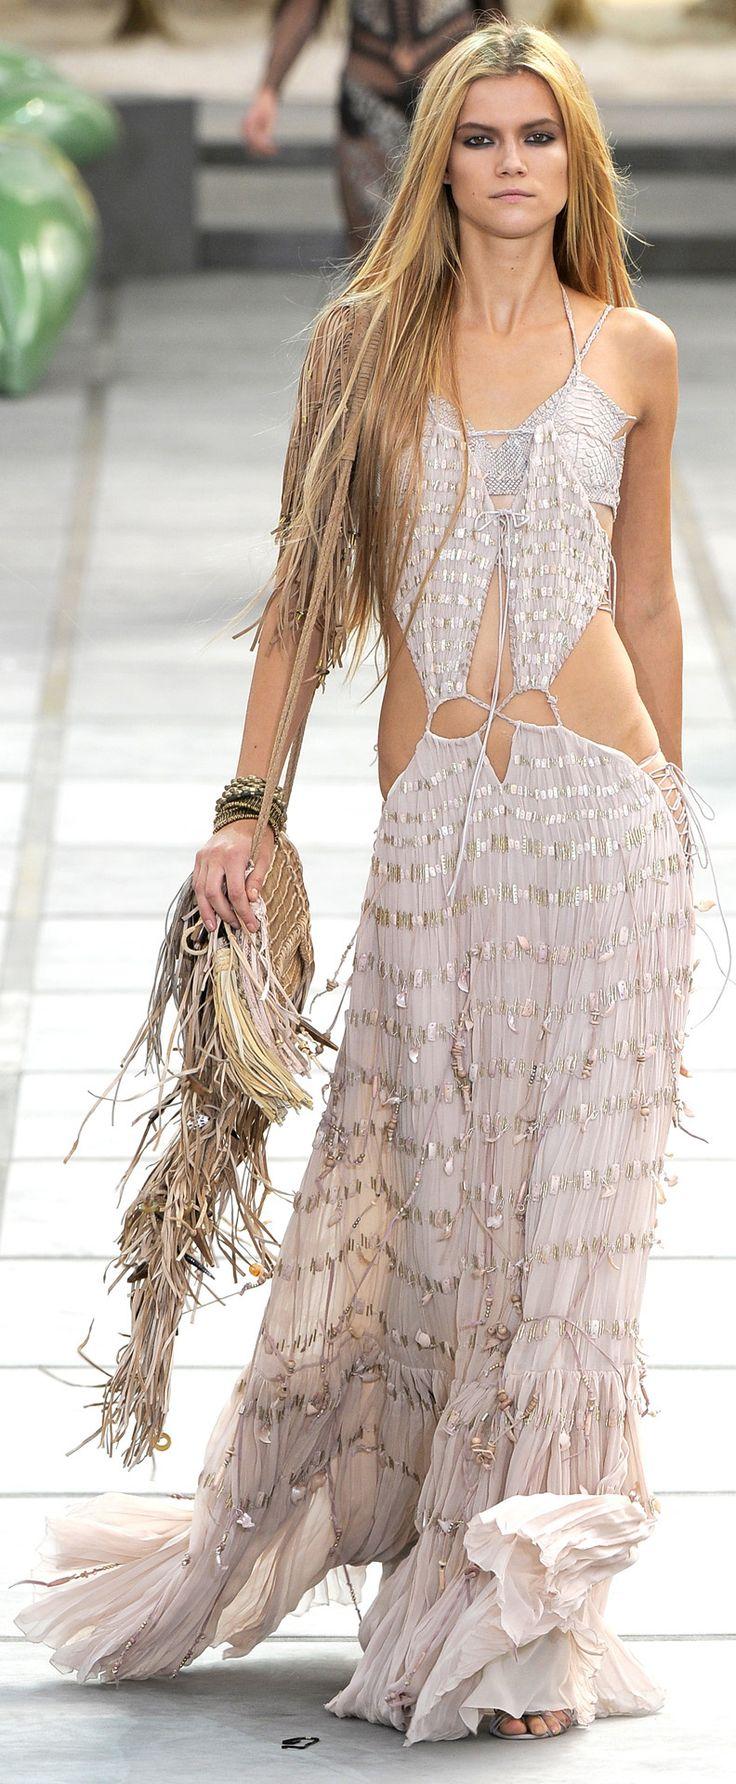 boho, feathers gypsy spirit